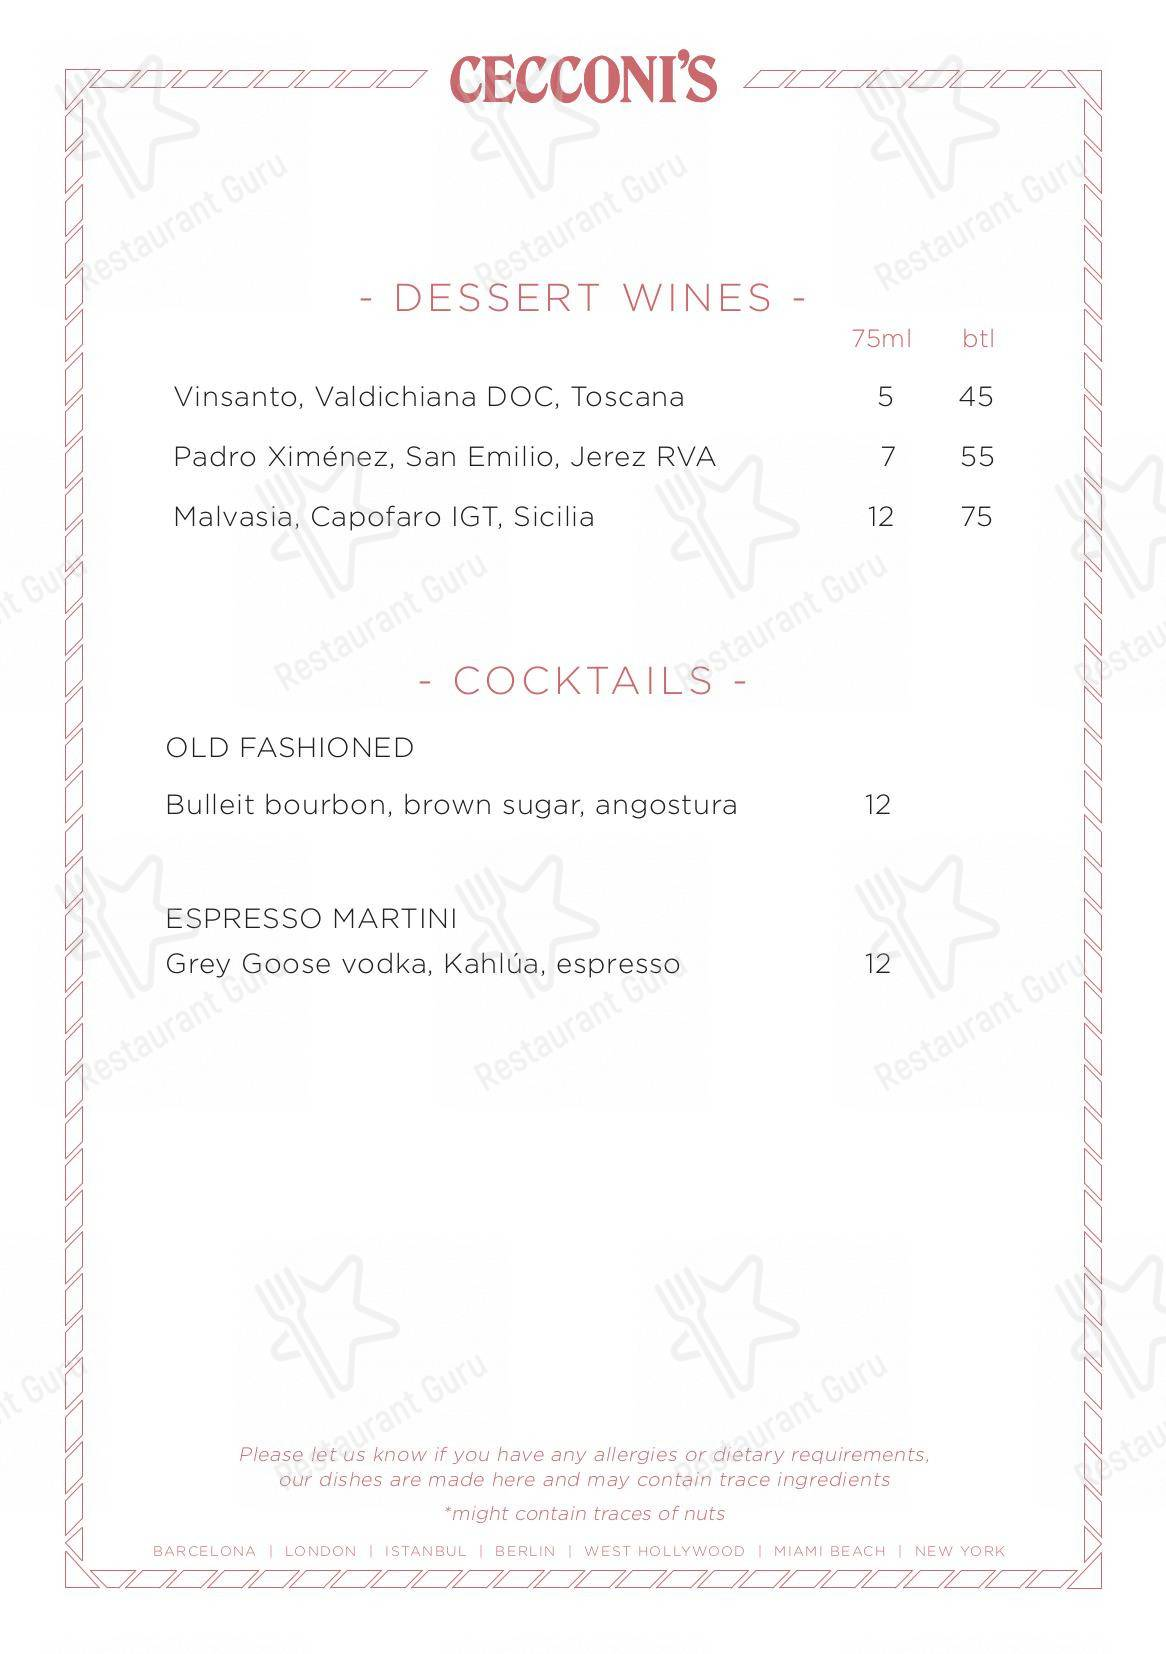 Check out the menu for Cecconi's Barcelona